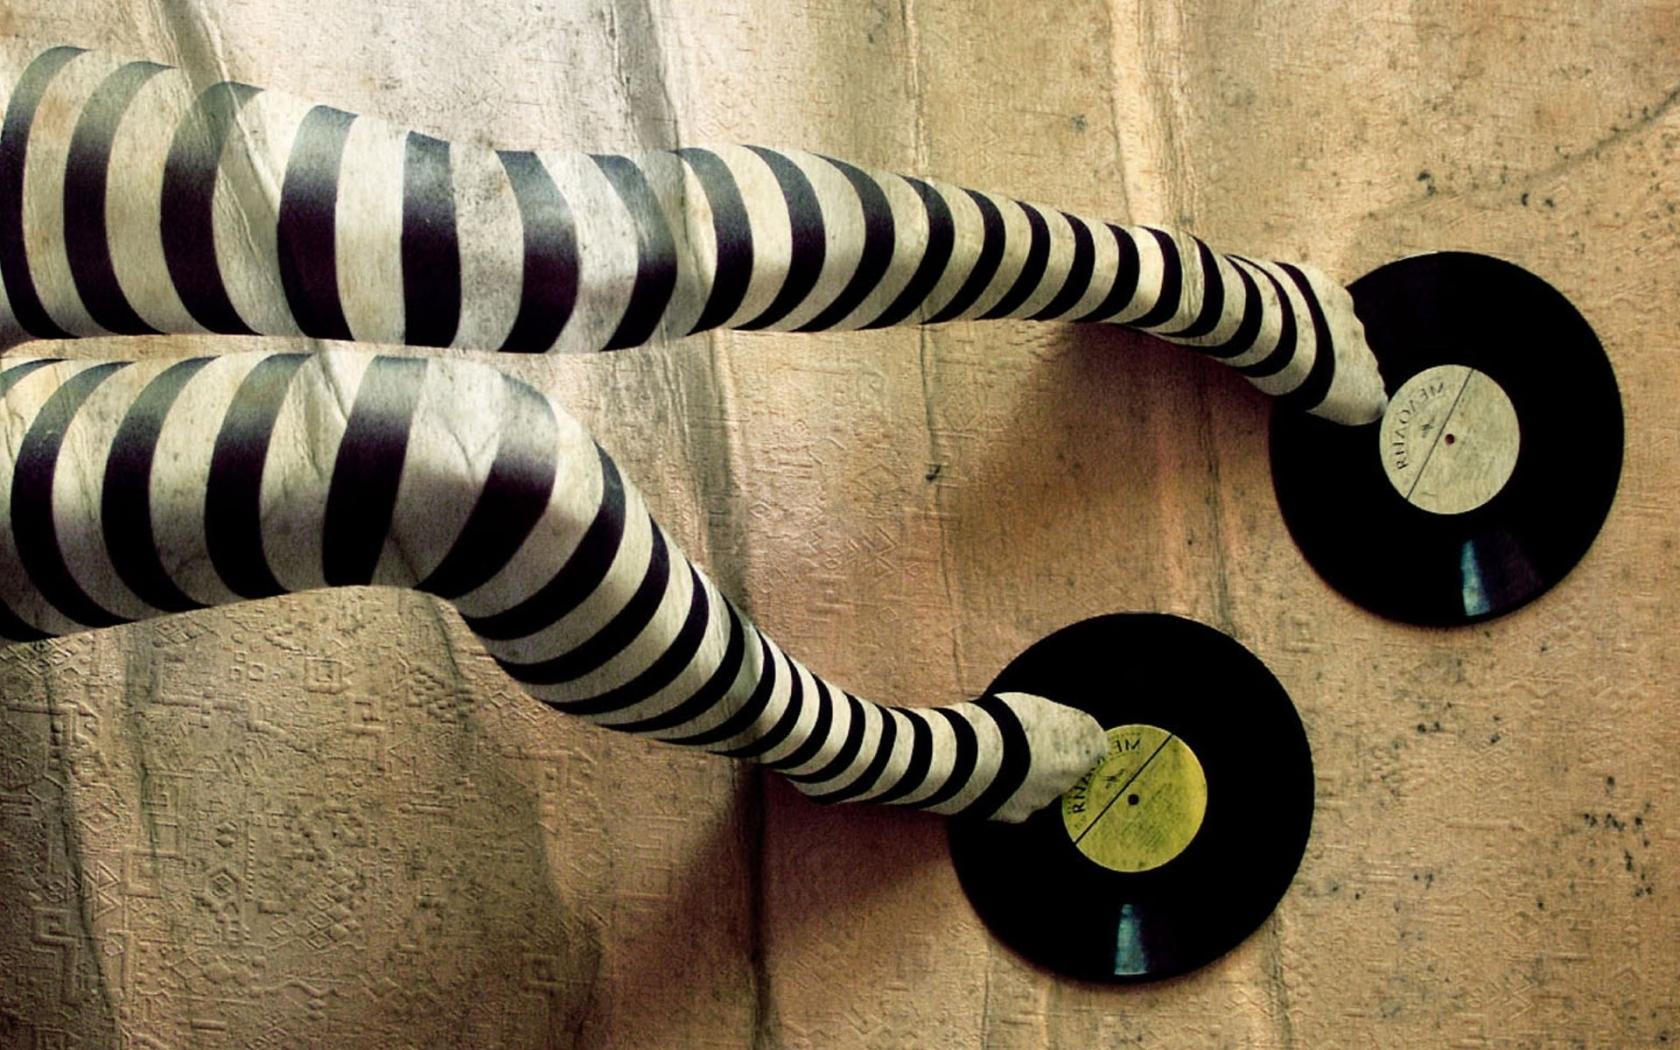 Medias rayadas y discos - 1680x1050